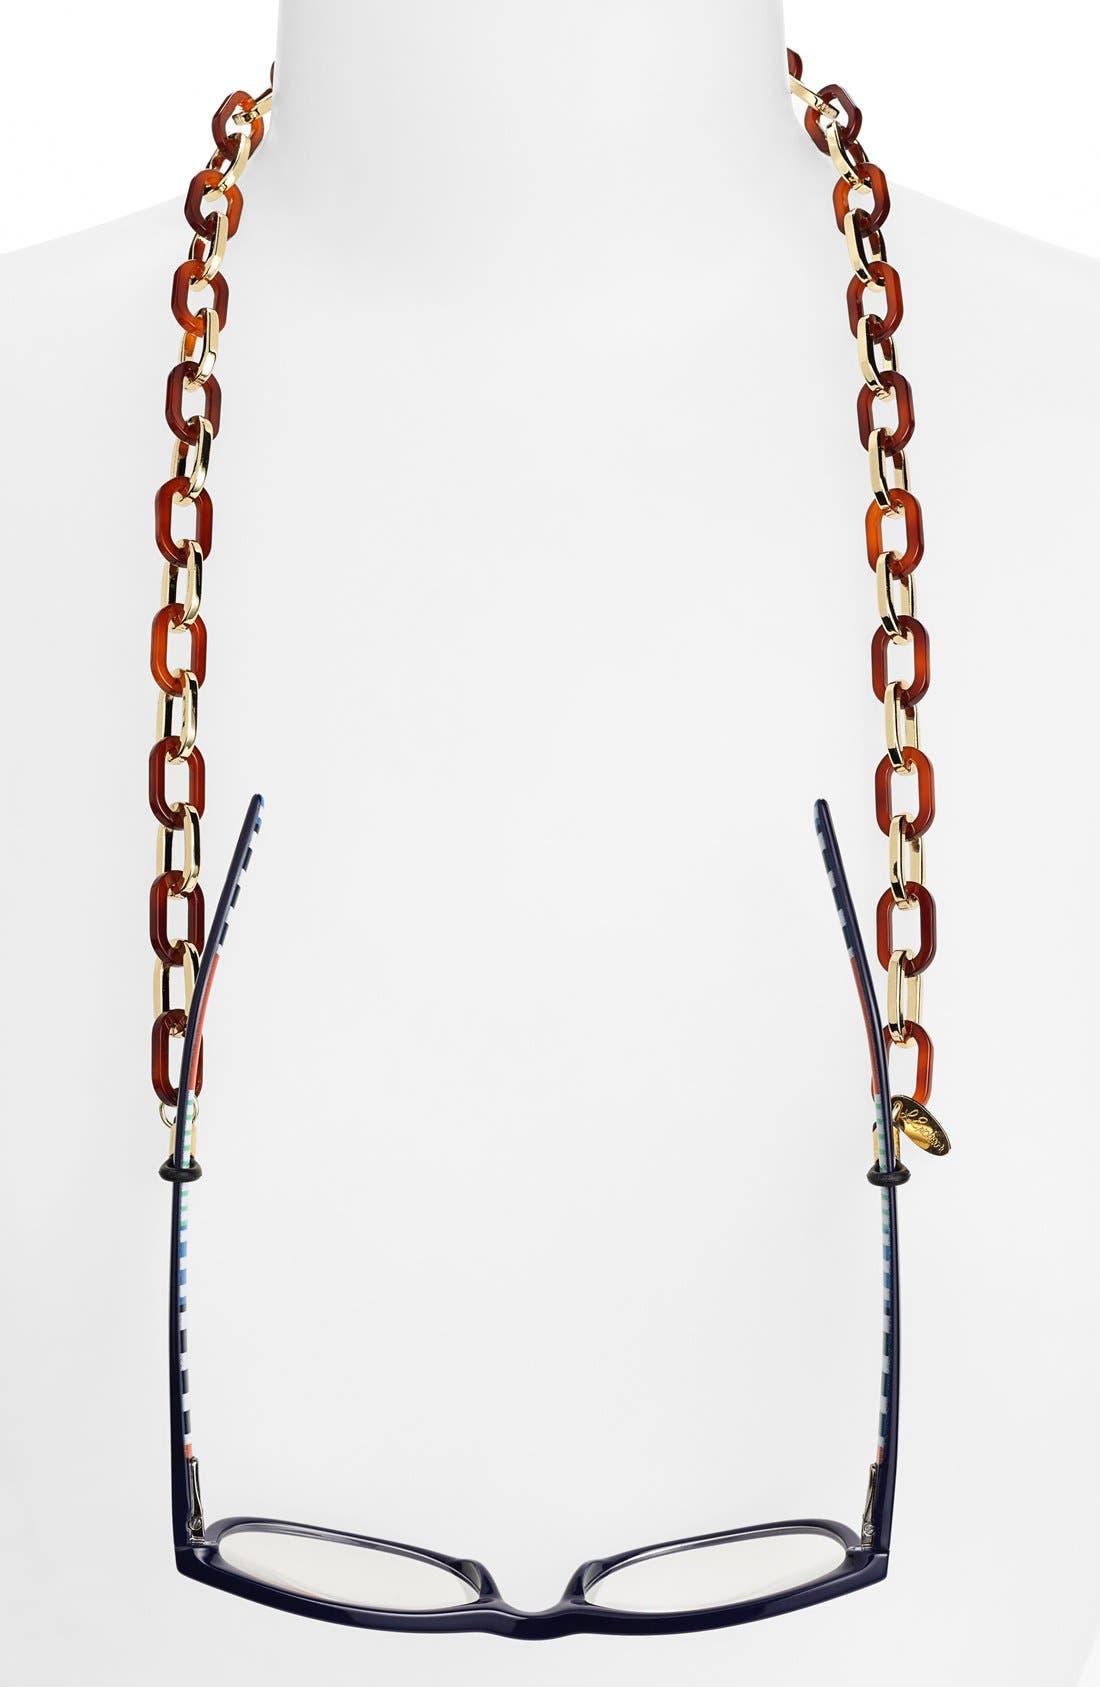 Alternate Image 1 Selected - L. Erickson 'Sarafine' Metal Link Eyewear Chain